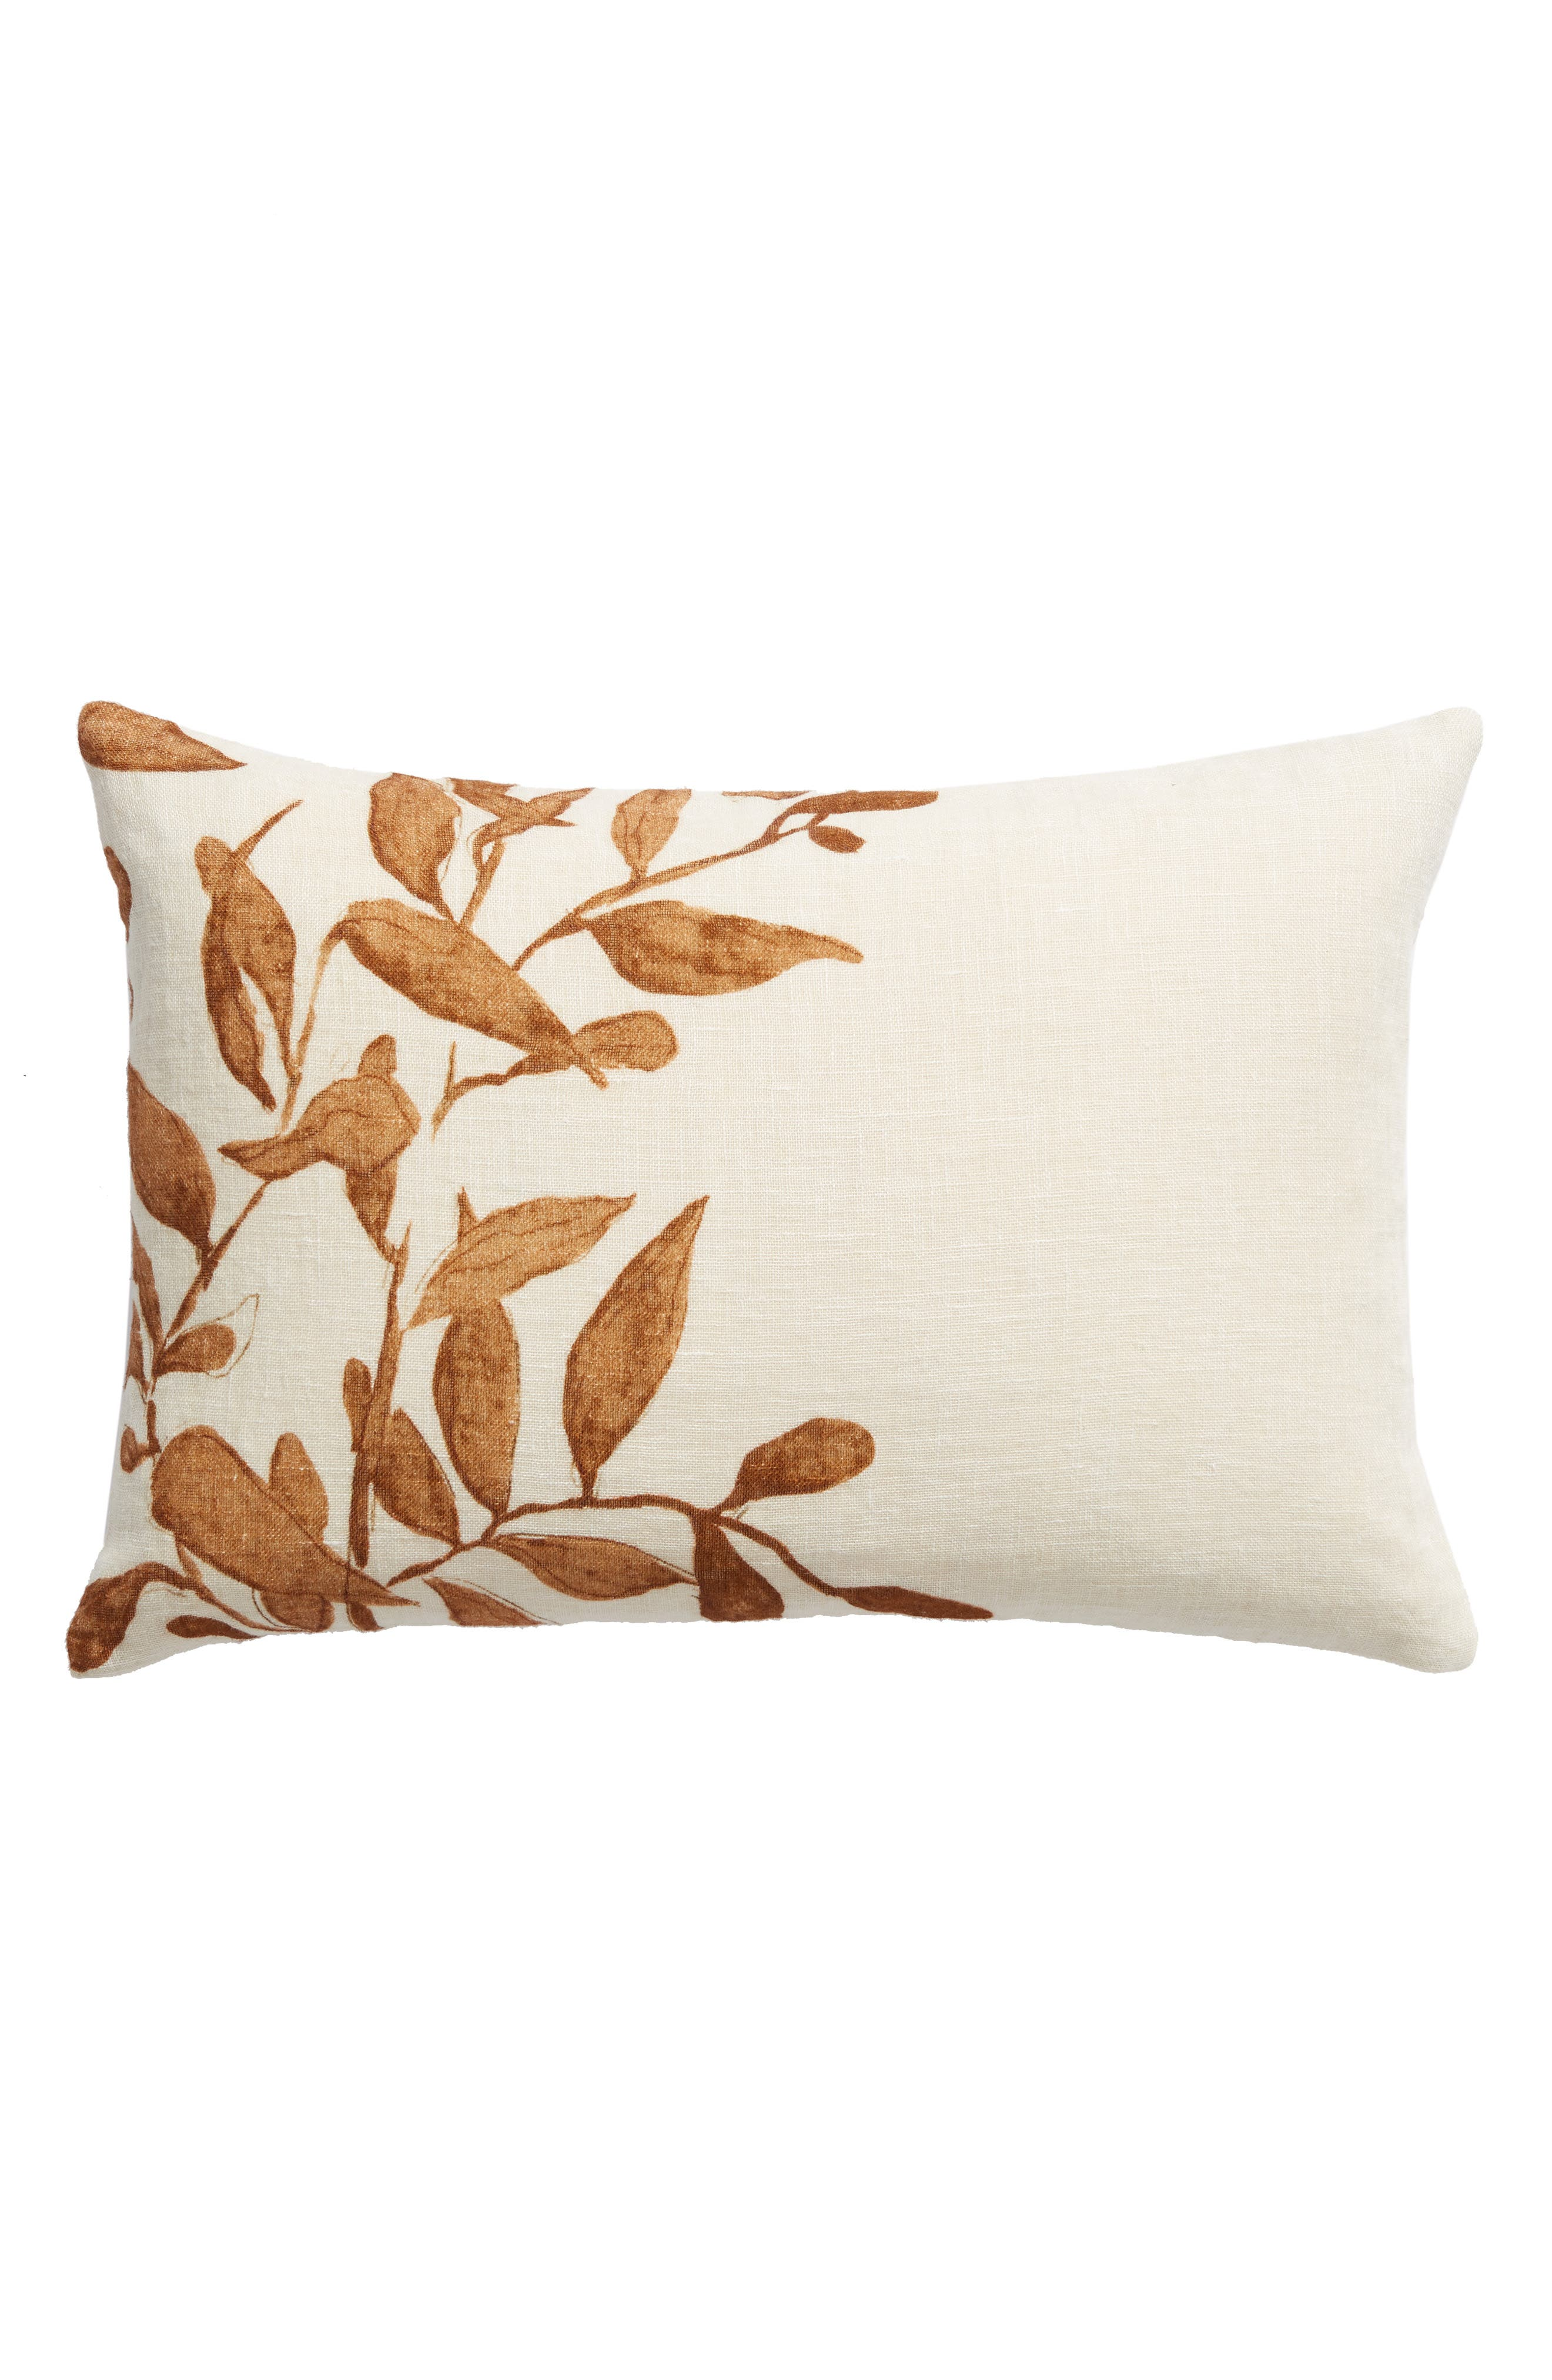 TREASURE & BOND Vine Accent Pillow, Main, color, BROWN RUSTIC MULTI